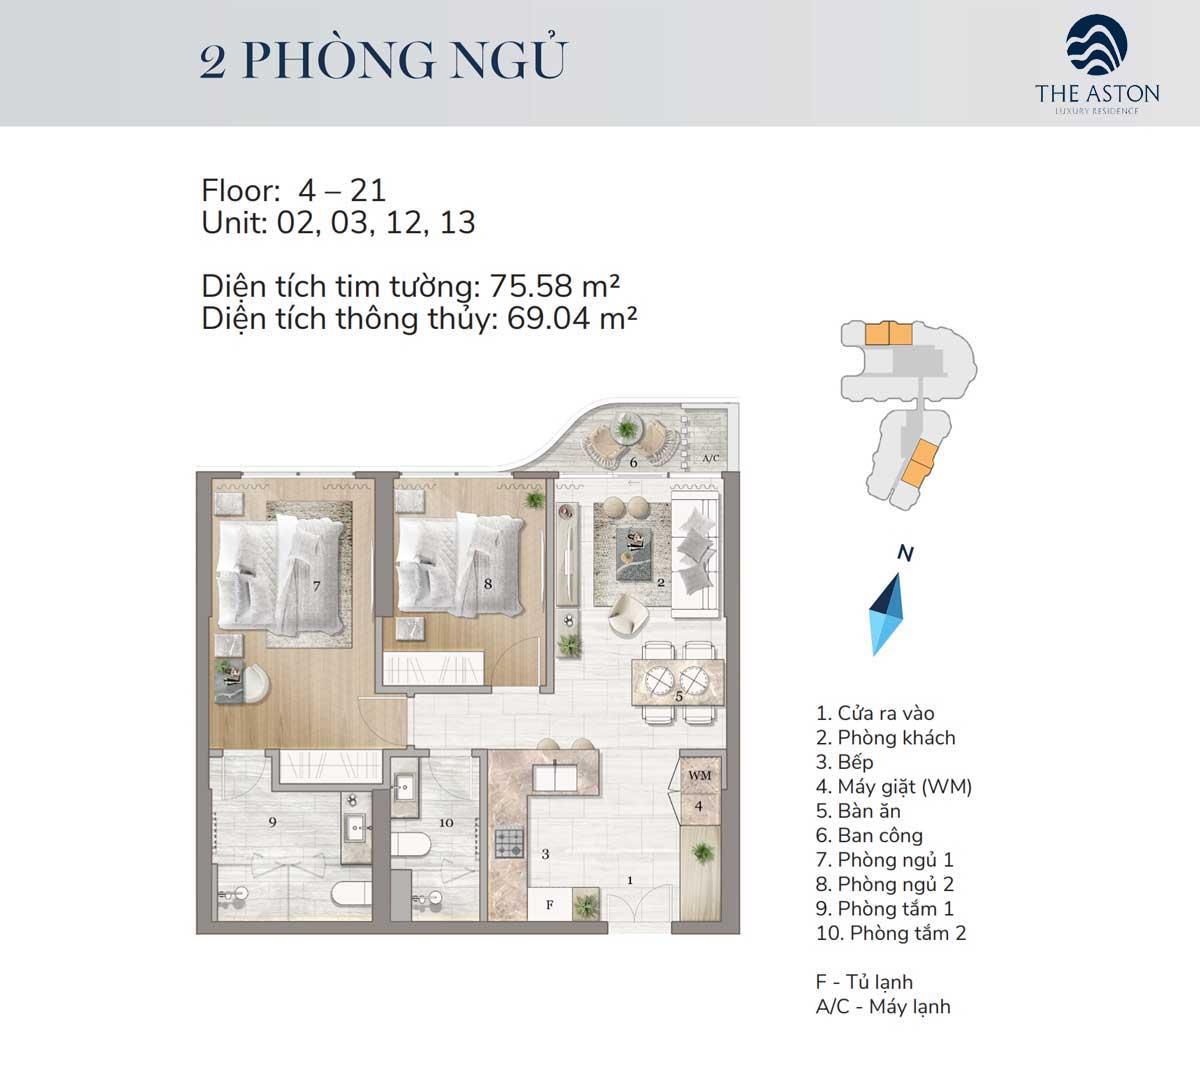 thiet ke can ho 2 phong ngu the aston luxury residence nha trang - THE ASTON LUXURY RESIDENCE NHA TRANG